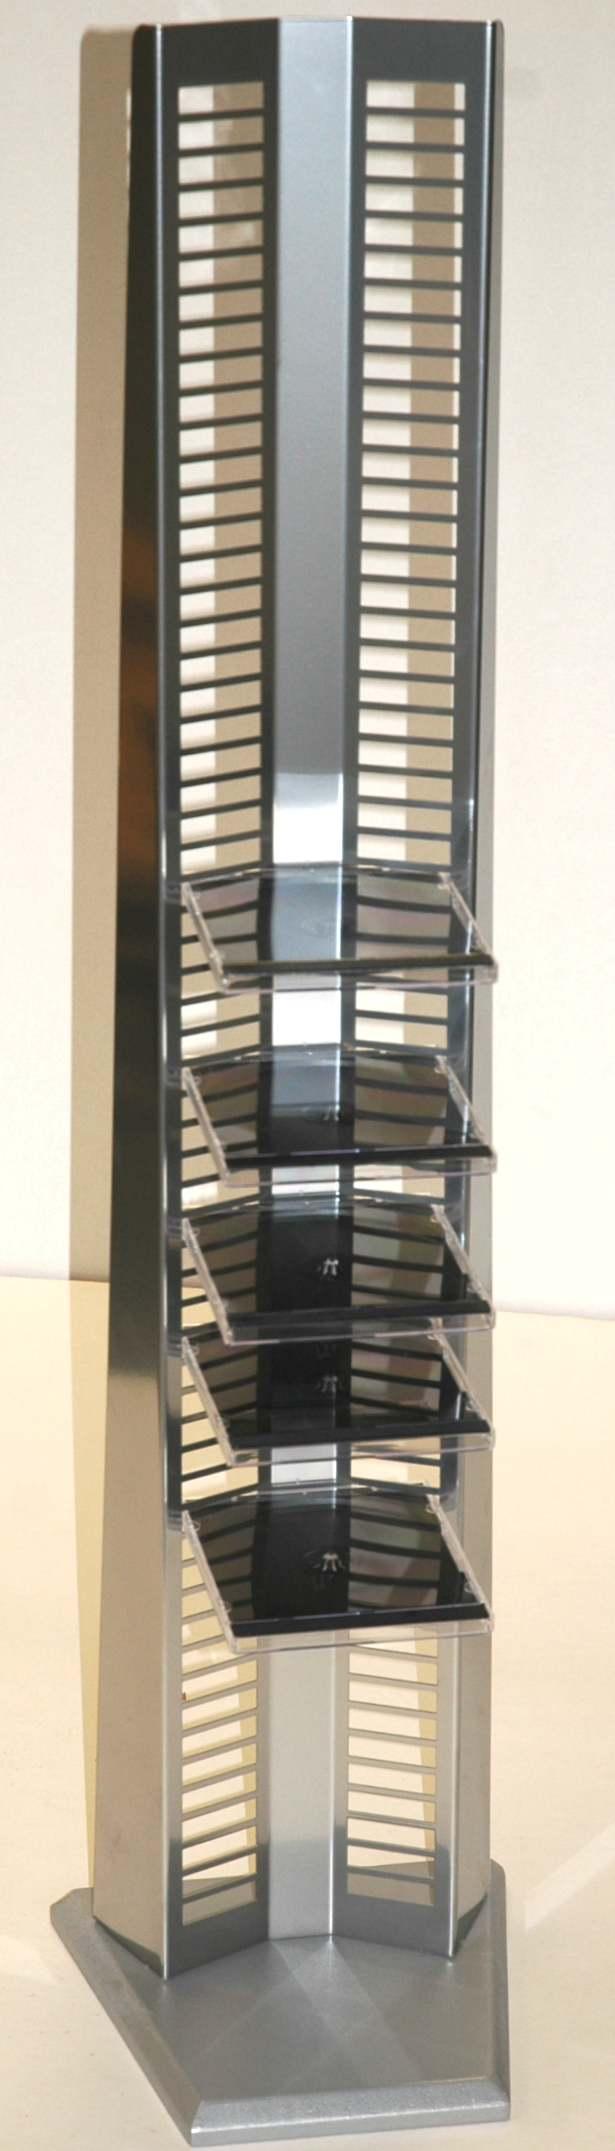 Silver wood chrome rack cd storage tower ebay - Cd storage rack tower ...